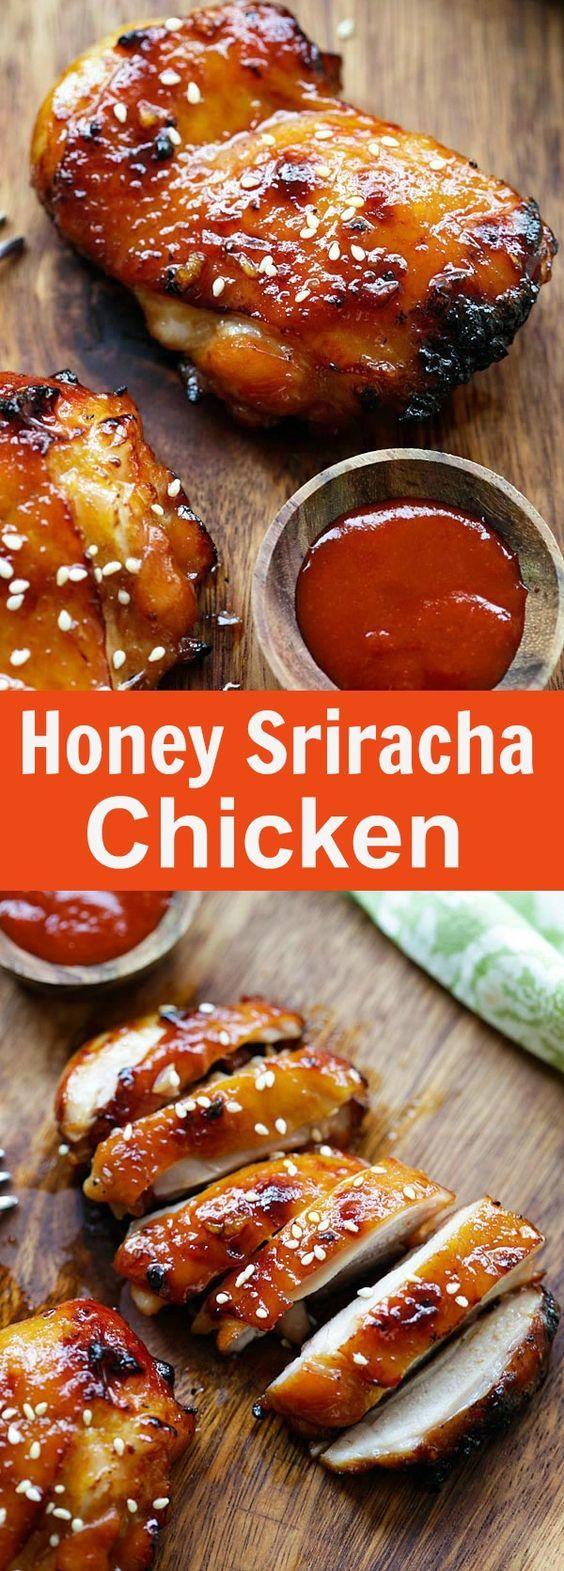 Honey Sriracha Chicken – crazy delicious chicken with honey sriracha marinade. Make it on a skillet, bake or grill for dinner tonight | rasamalaysia.com: